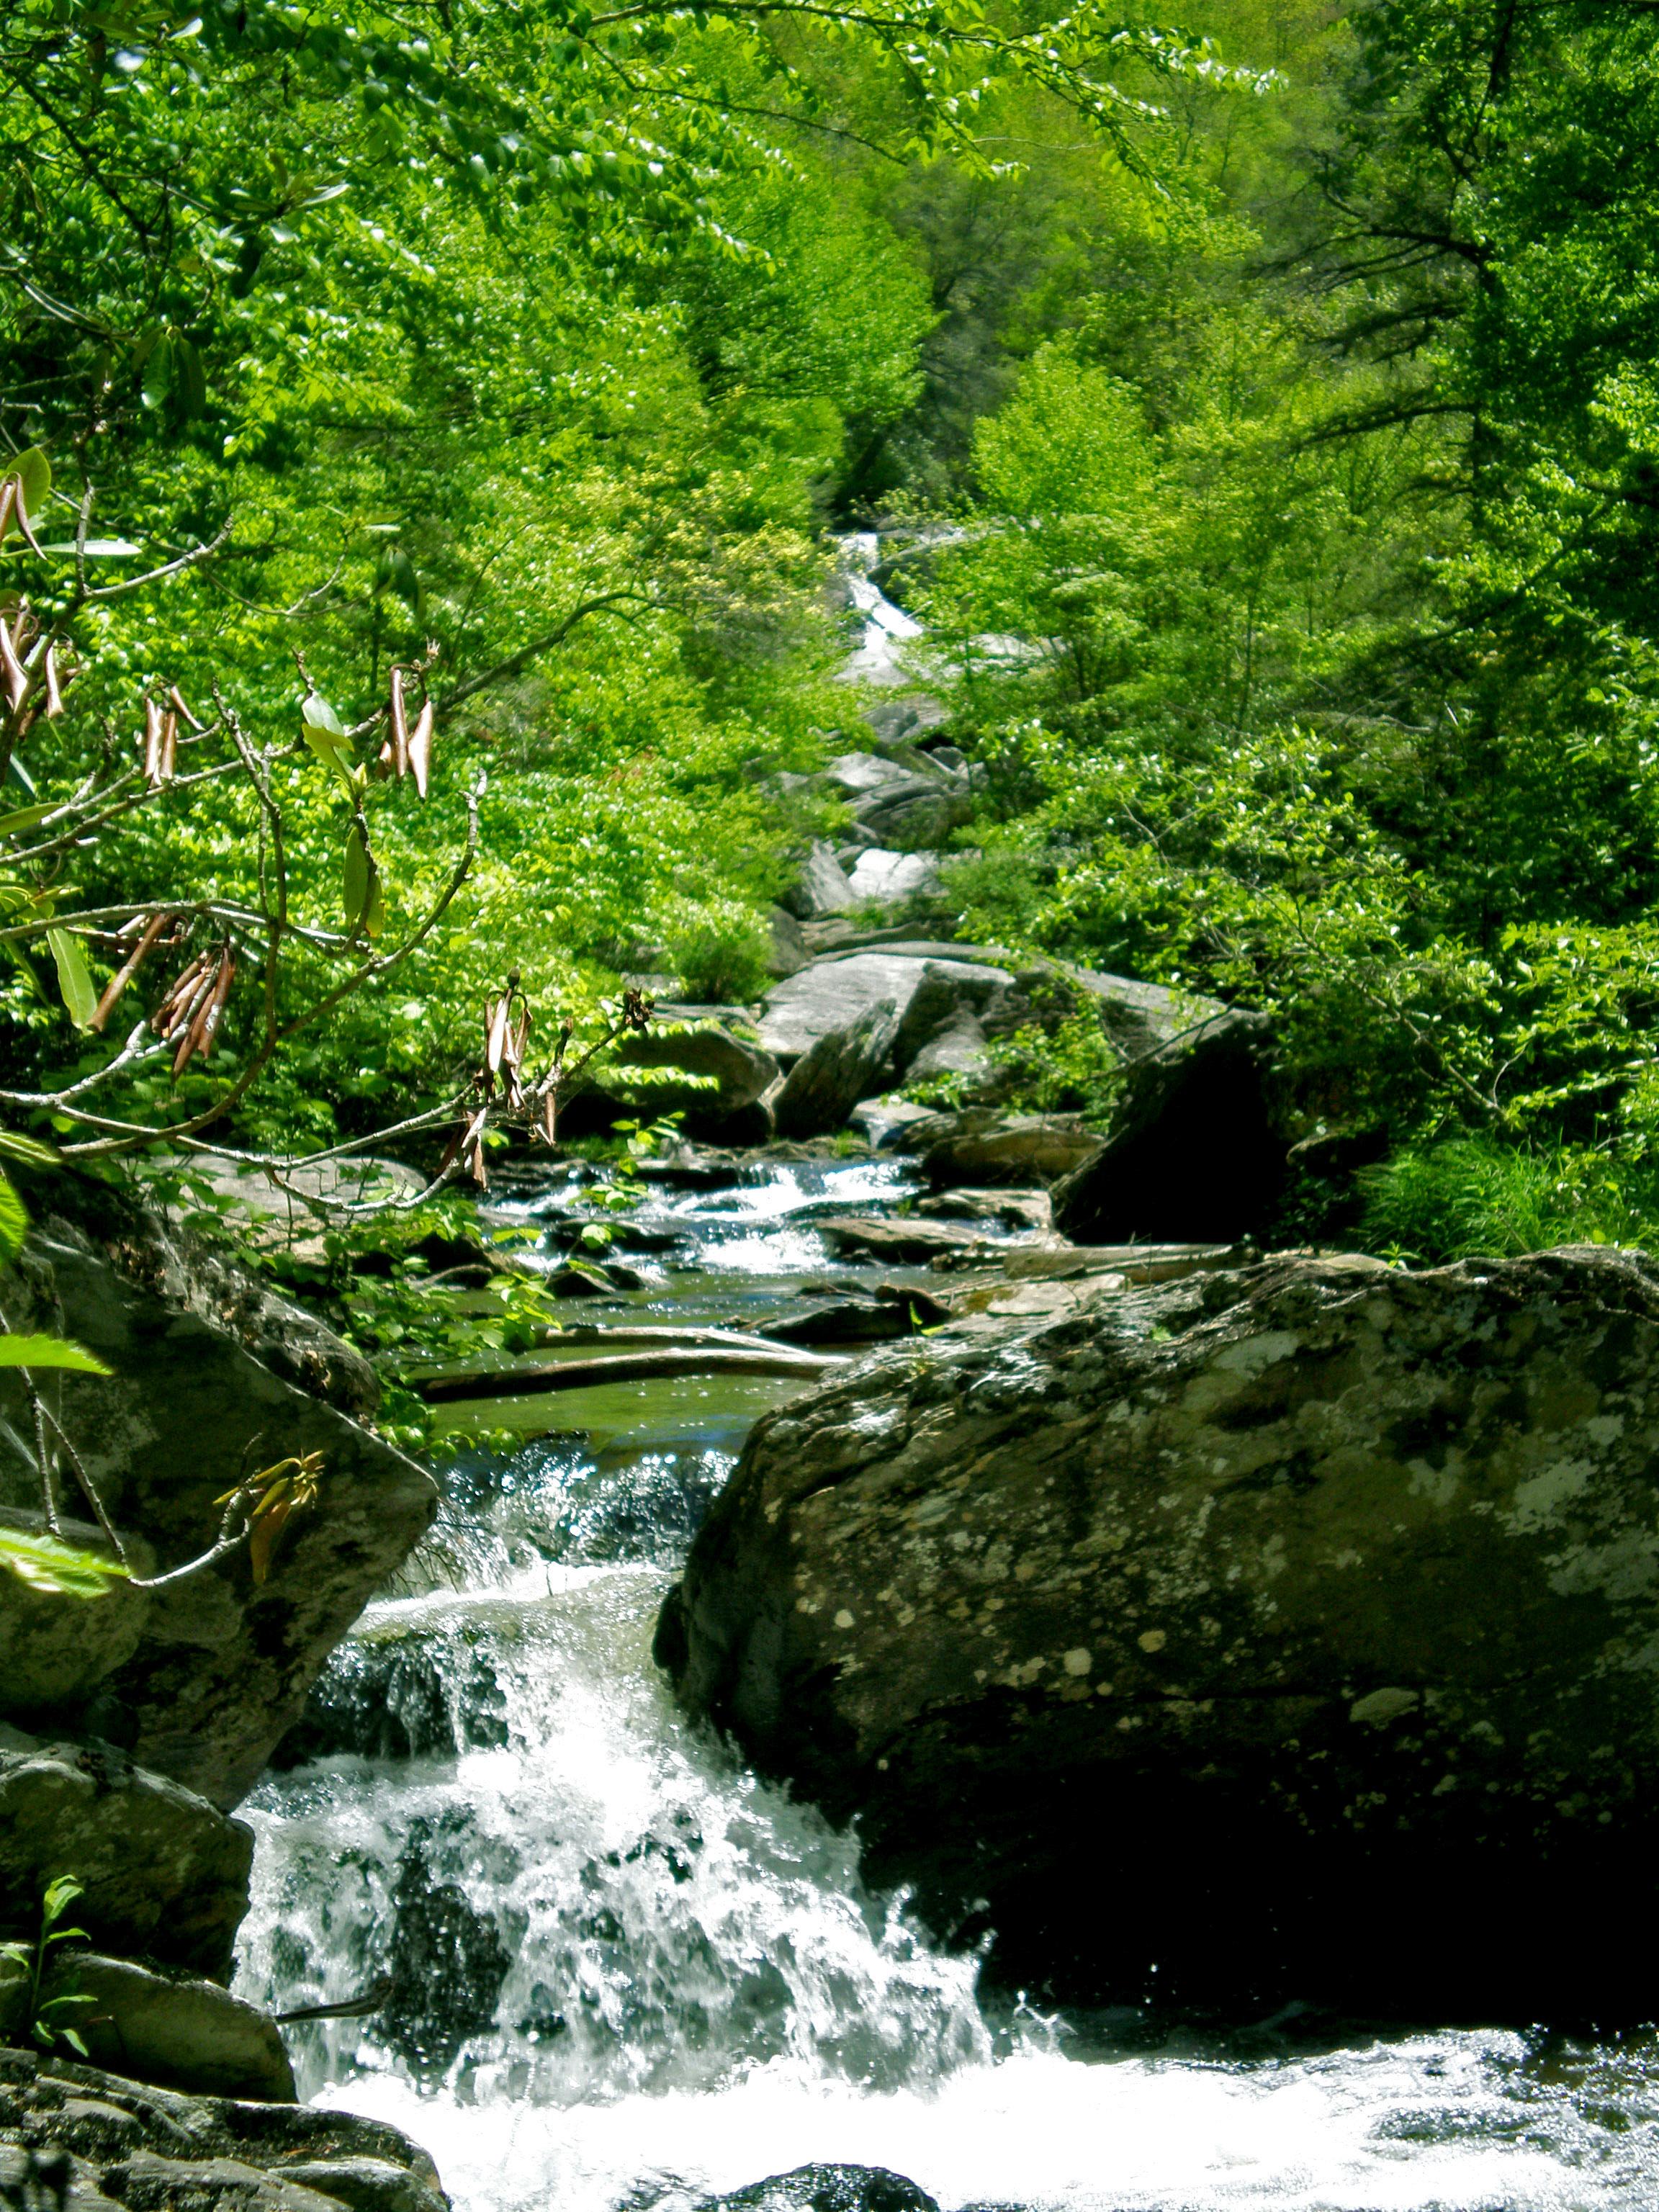 Hebron Falls, waterfalls near Blowing Rock NC